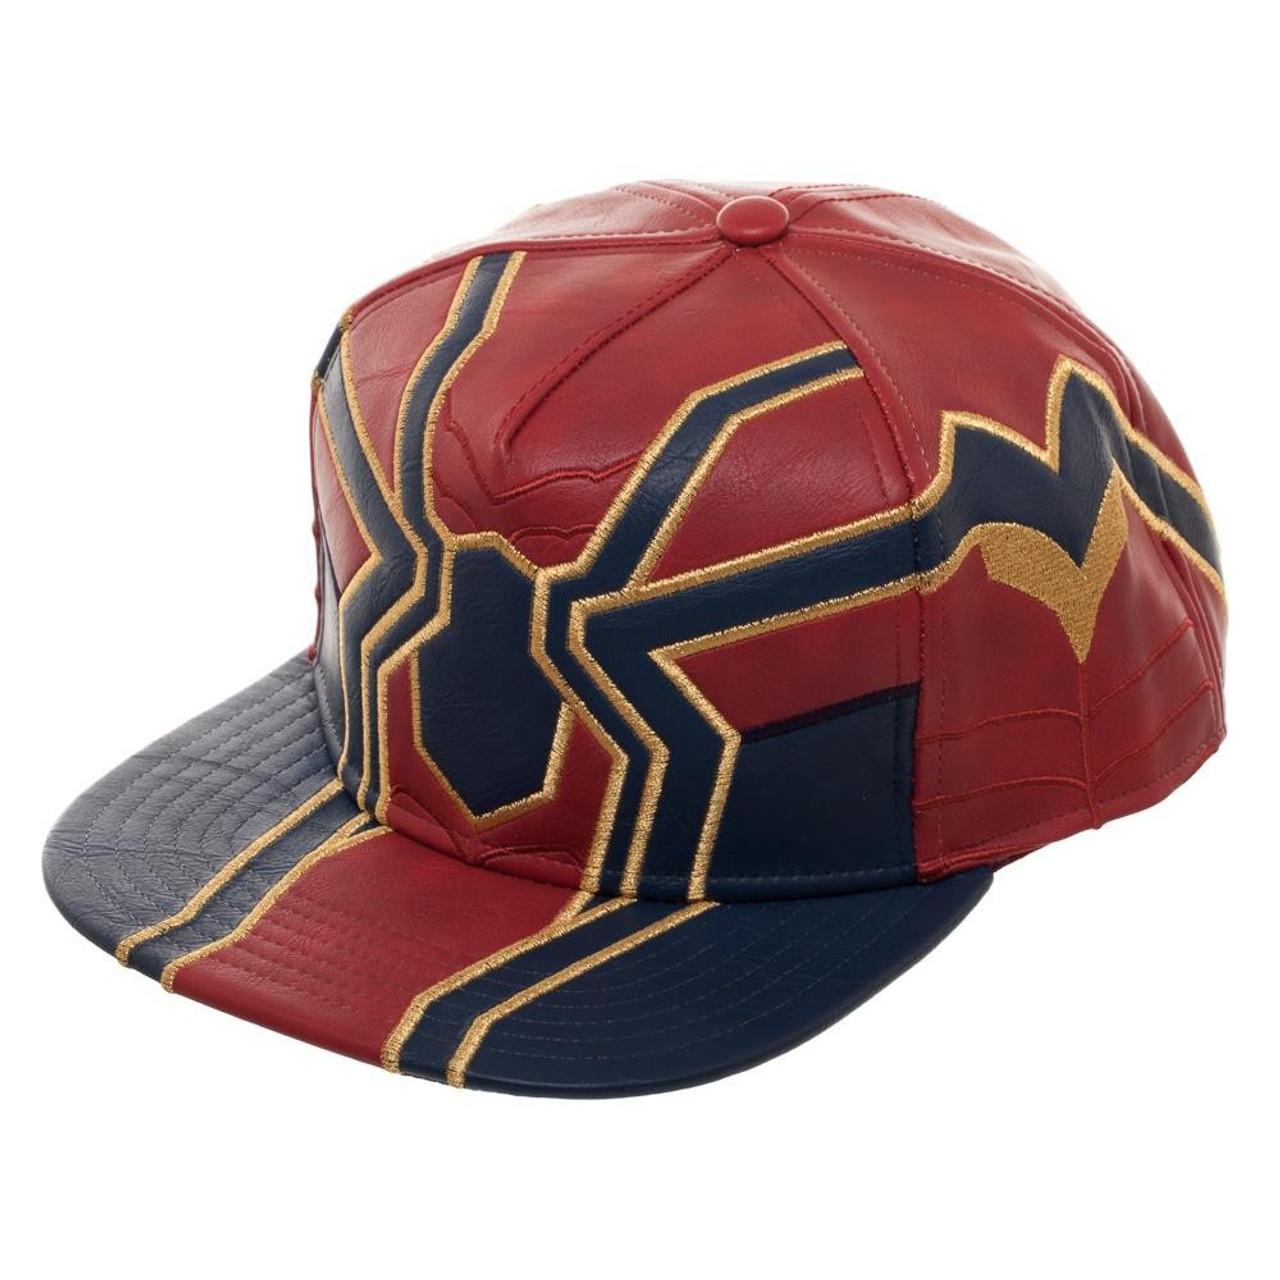 bb52abd2d Marvel Avengers Infinity War Iron Spider Suit Up PU Snapback Cap